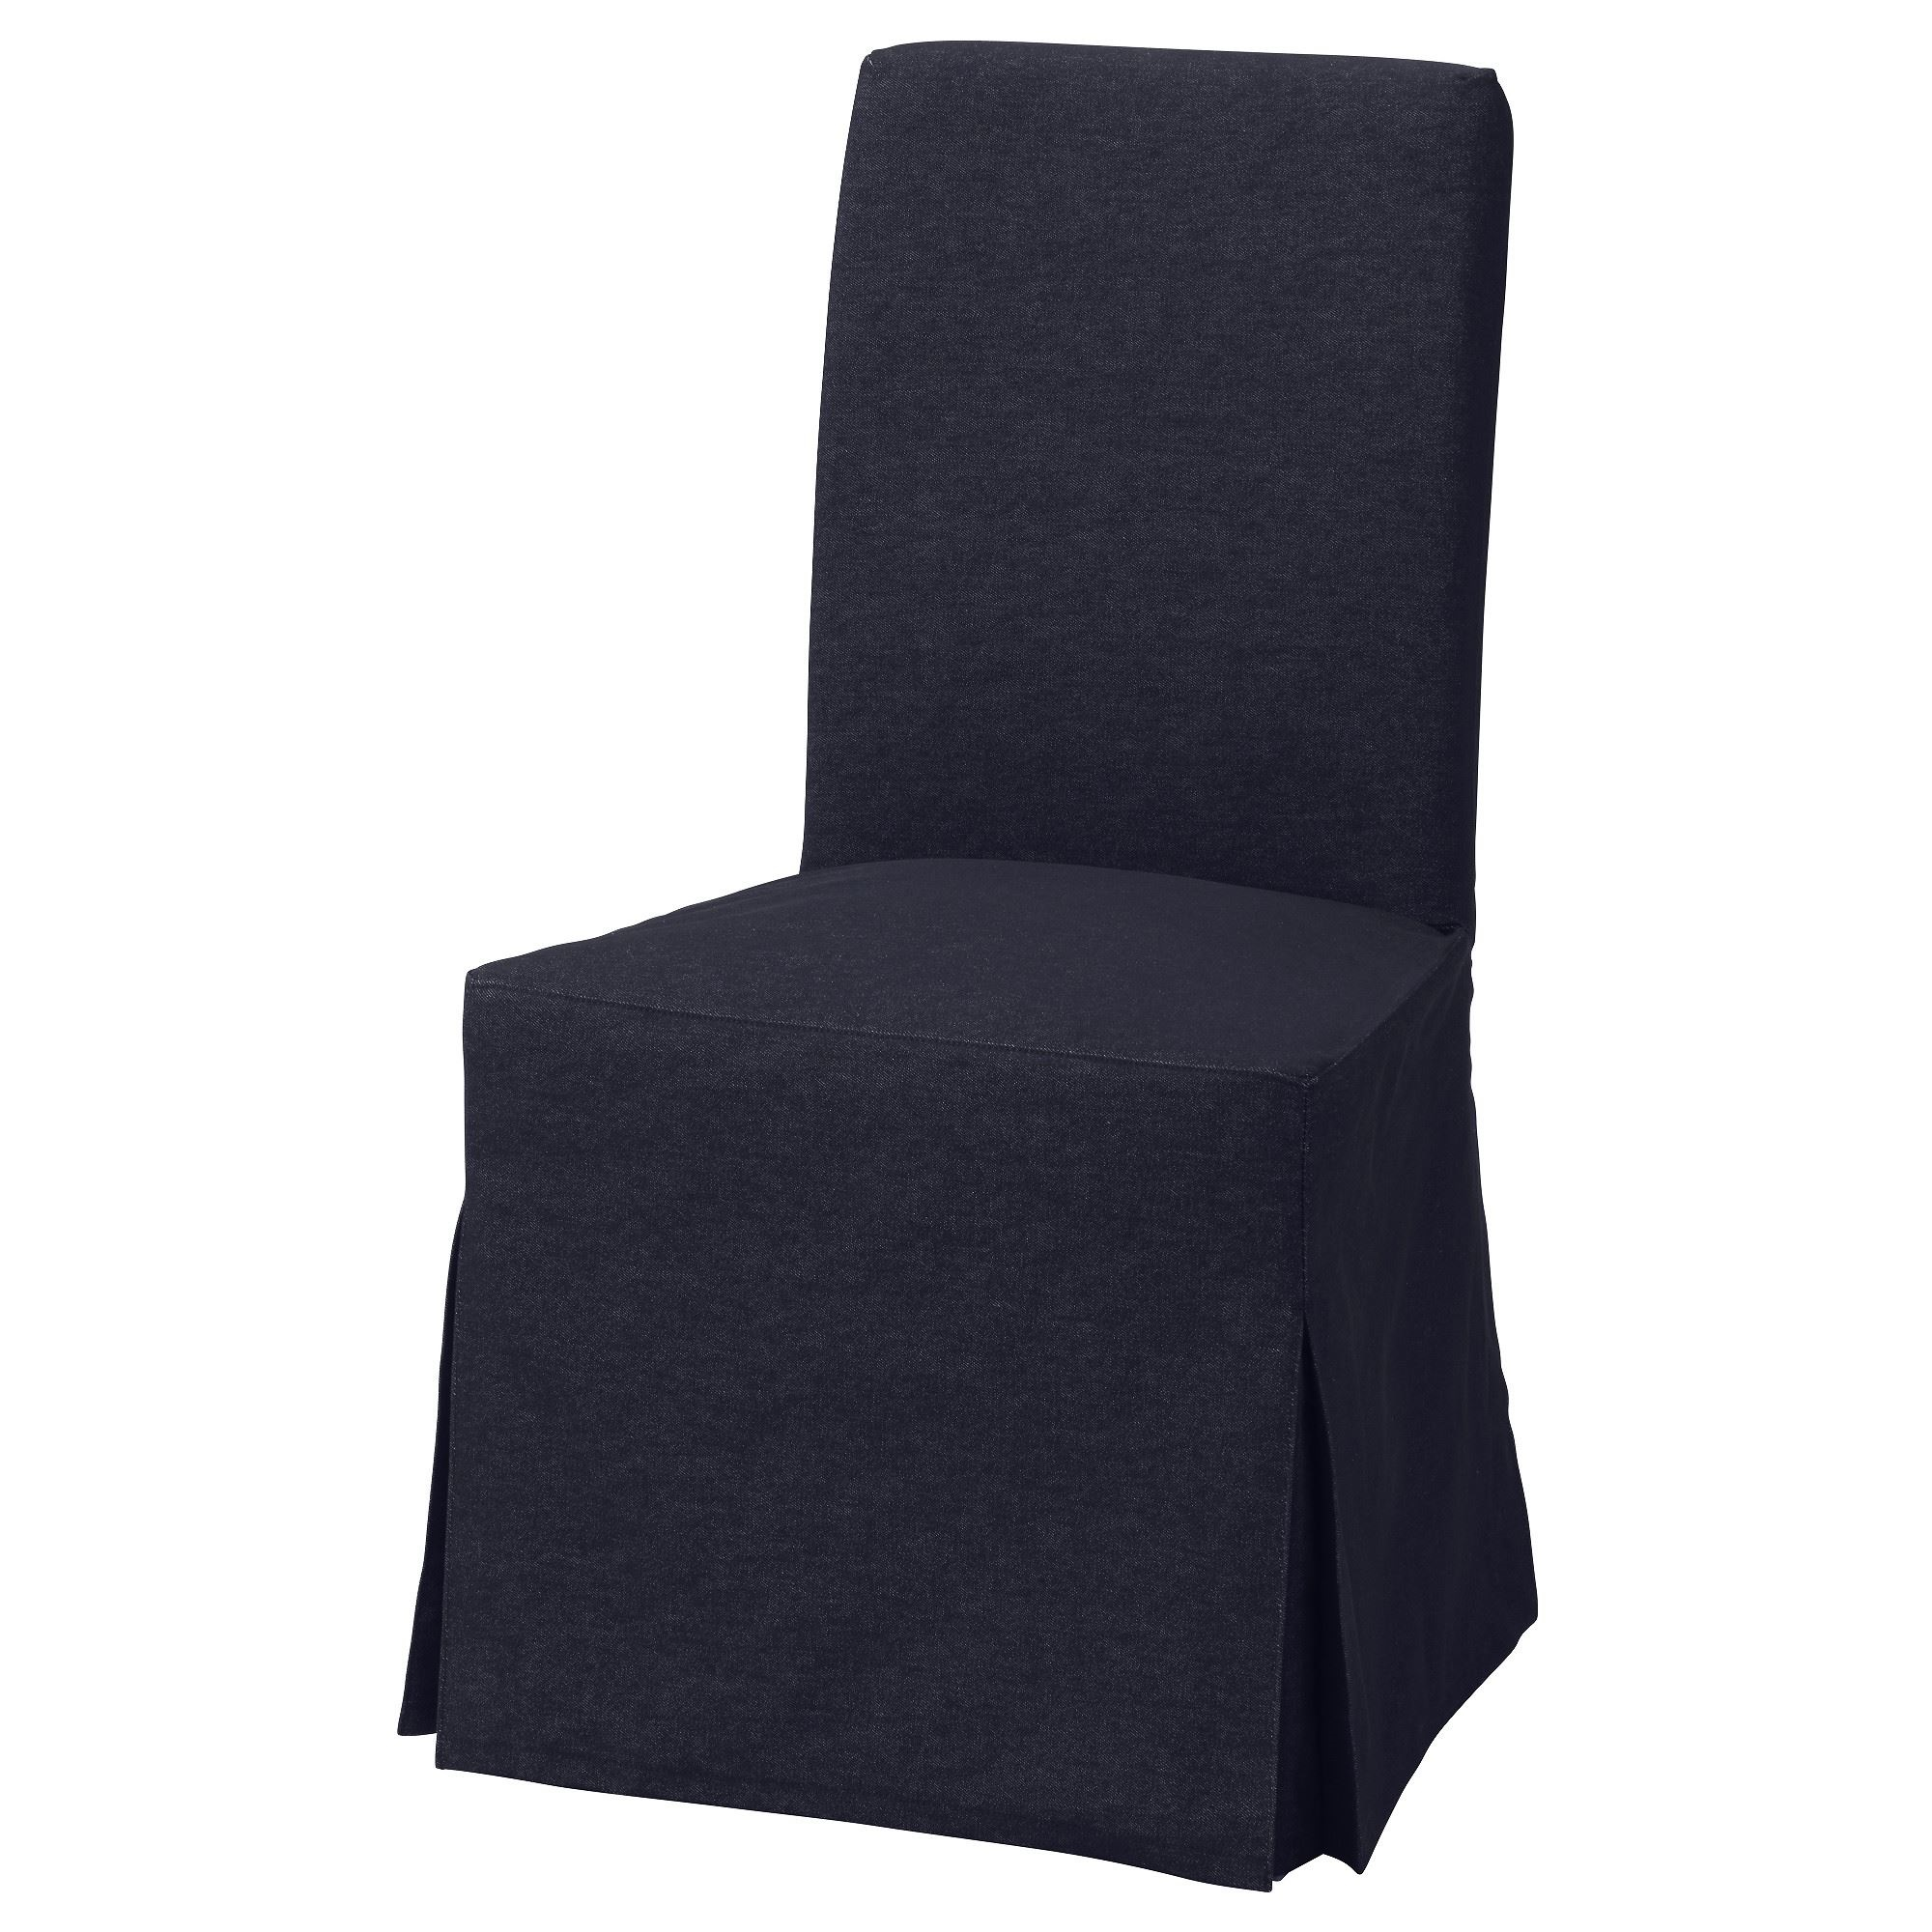 чехол на стул из льна